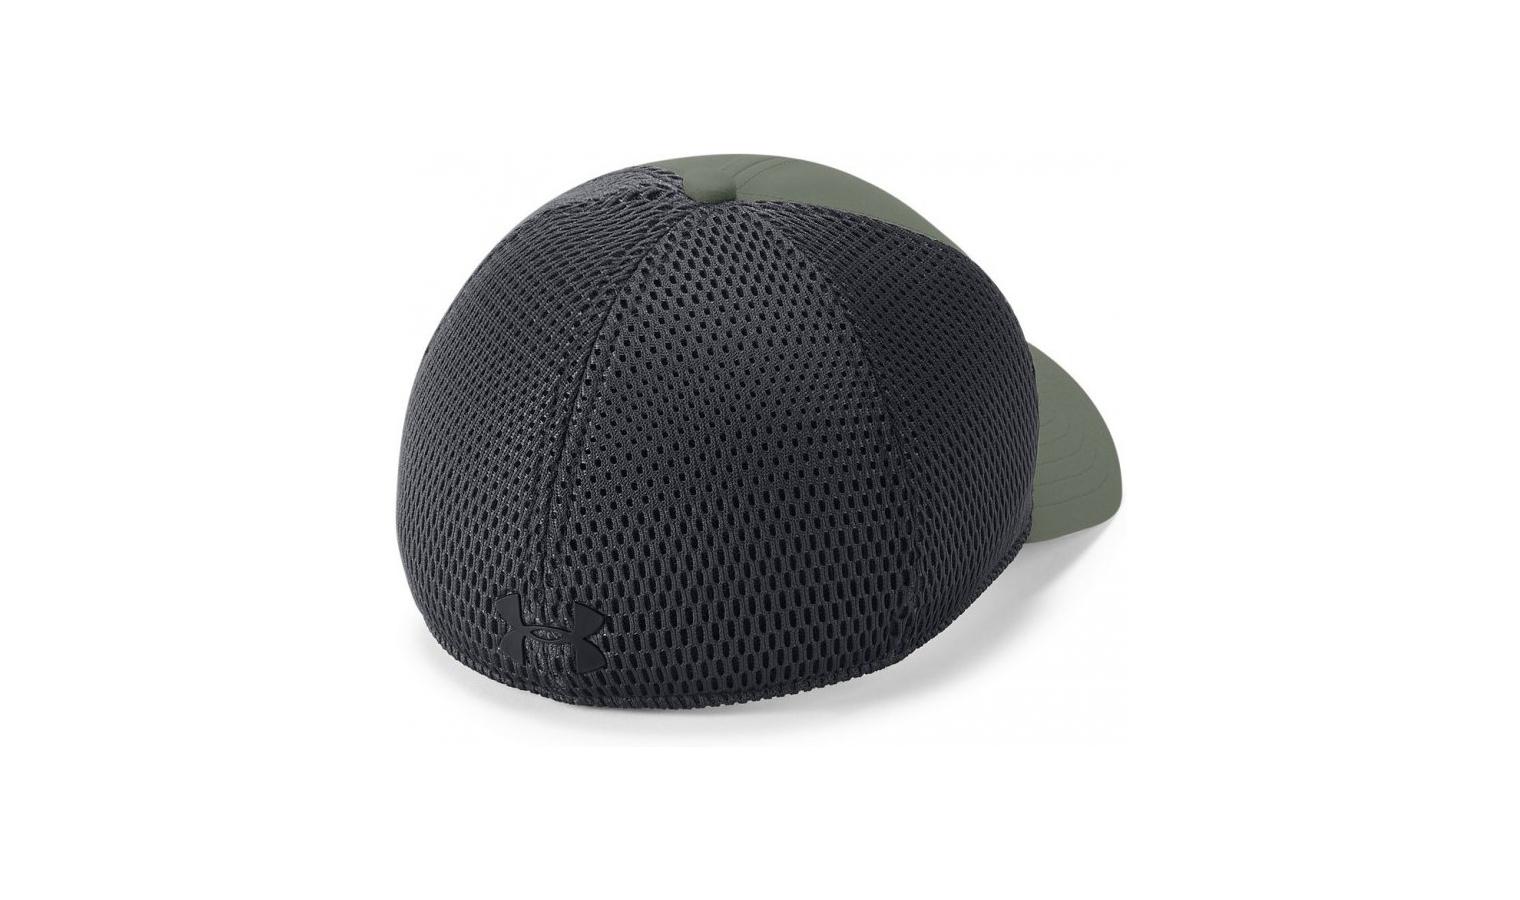 ... Pánská kšiltovka Under Armour TRAIN SPACER MESH CAP zelená. Sleva e6dc7470f8